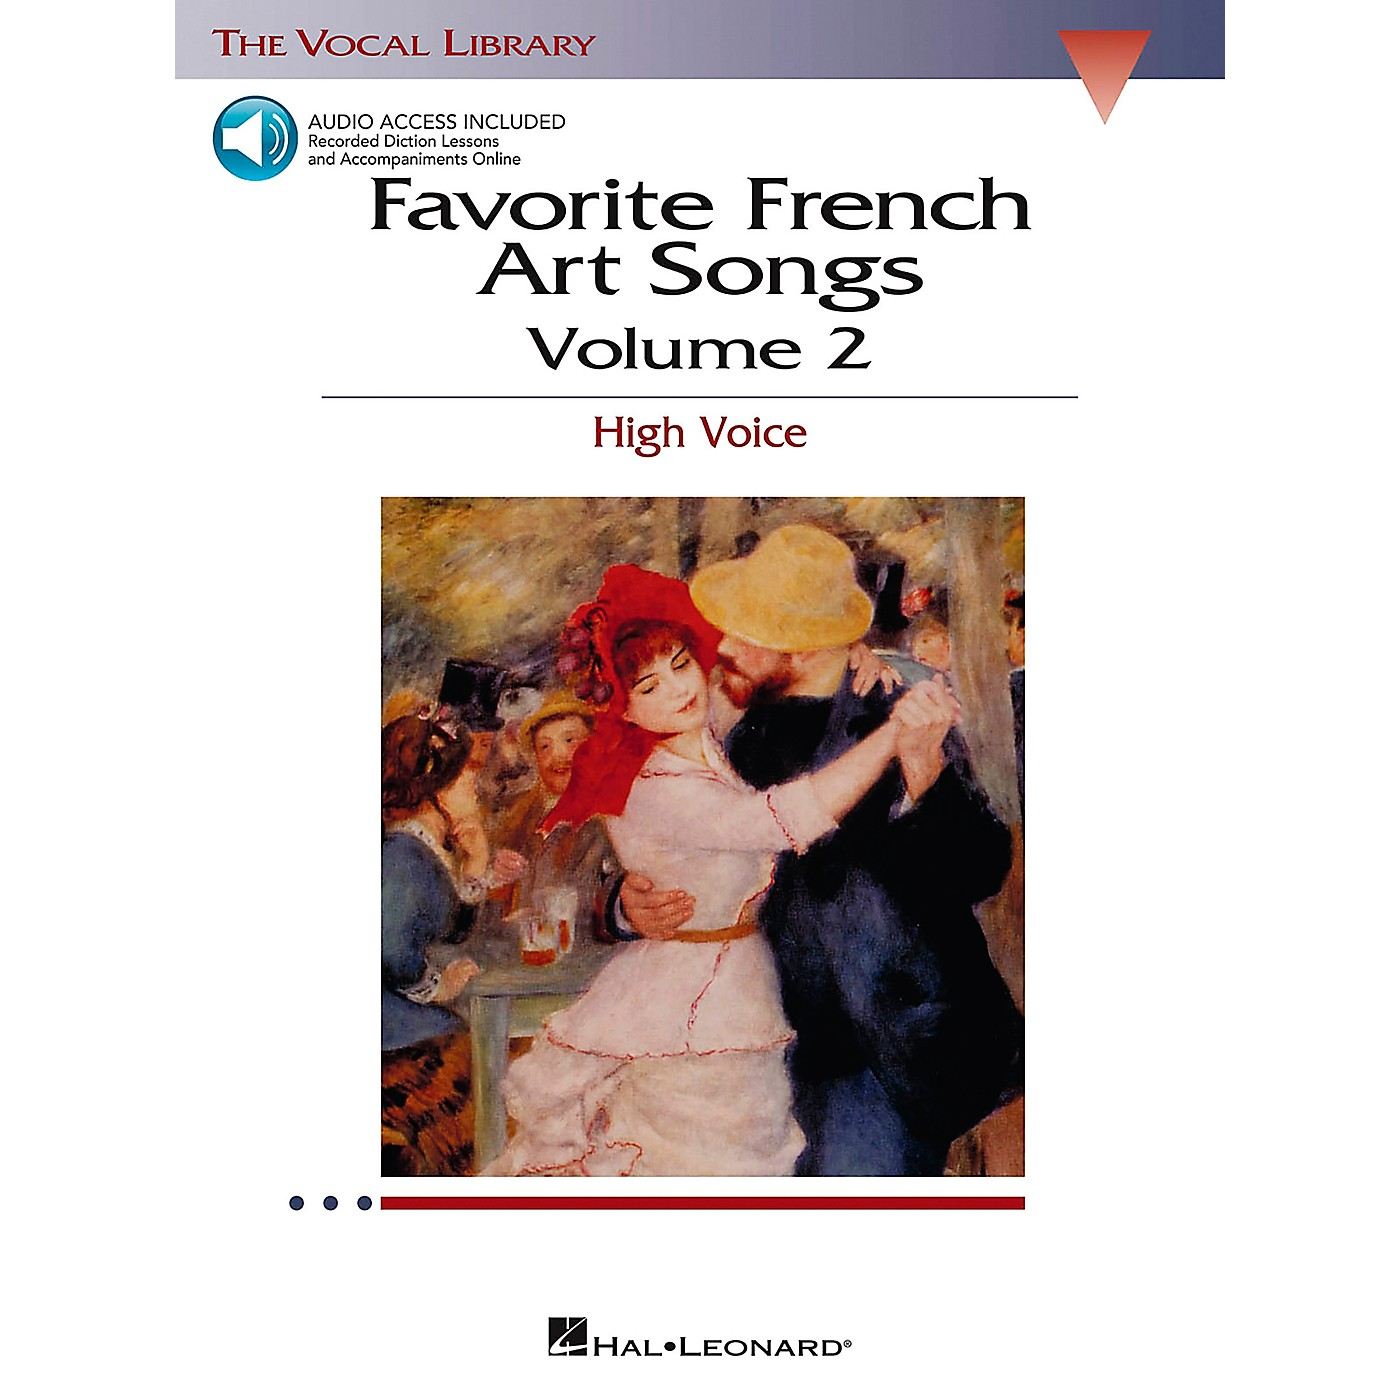 Hal Leonard Favorite French Art Songs for High Voice Volume 2 Book/CD thumbnail